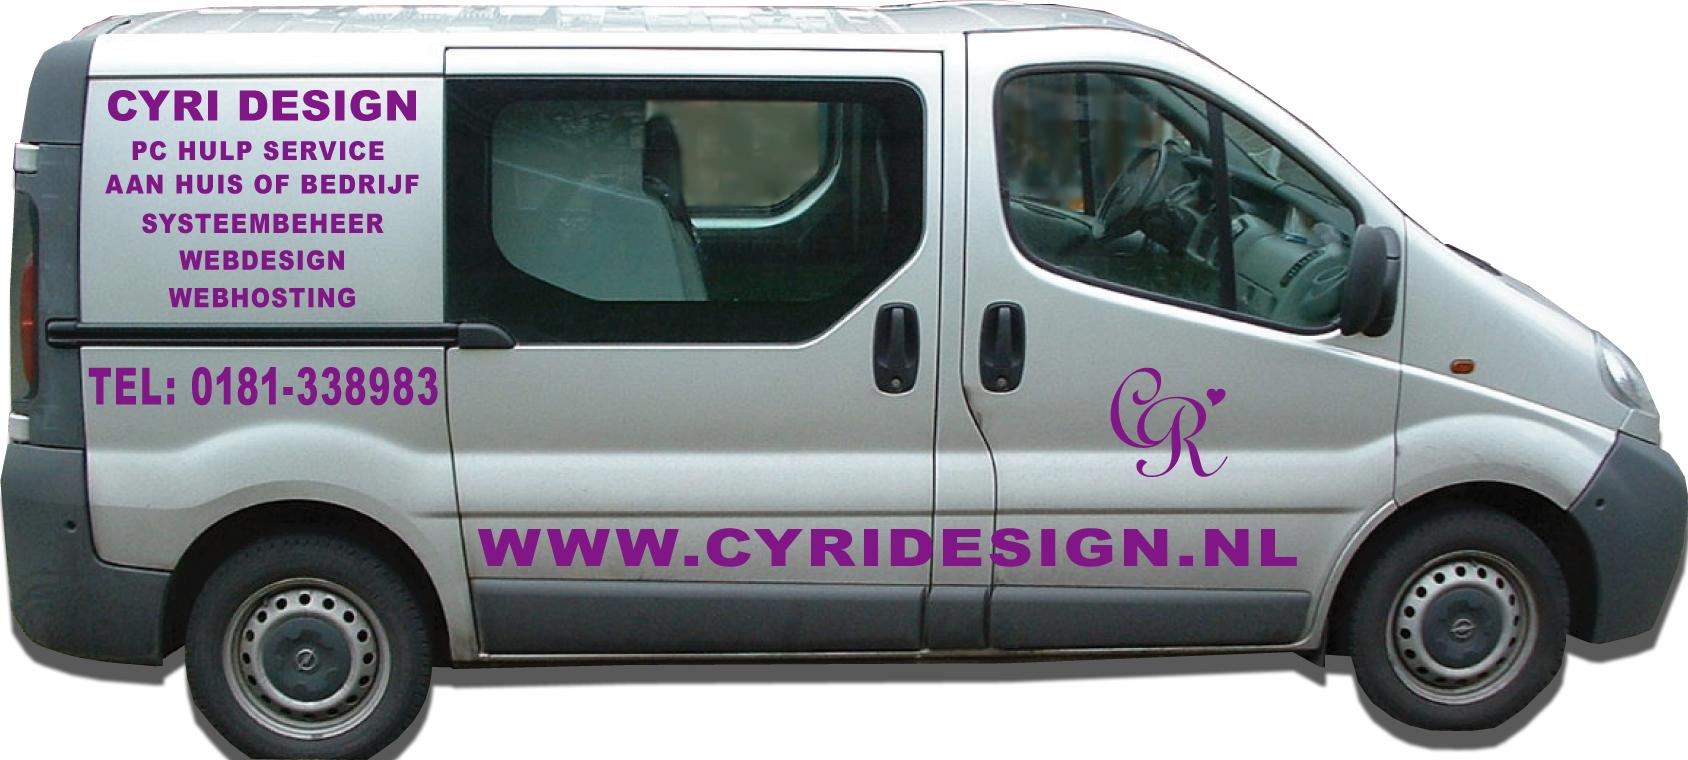 CYRI DESIGN